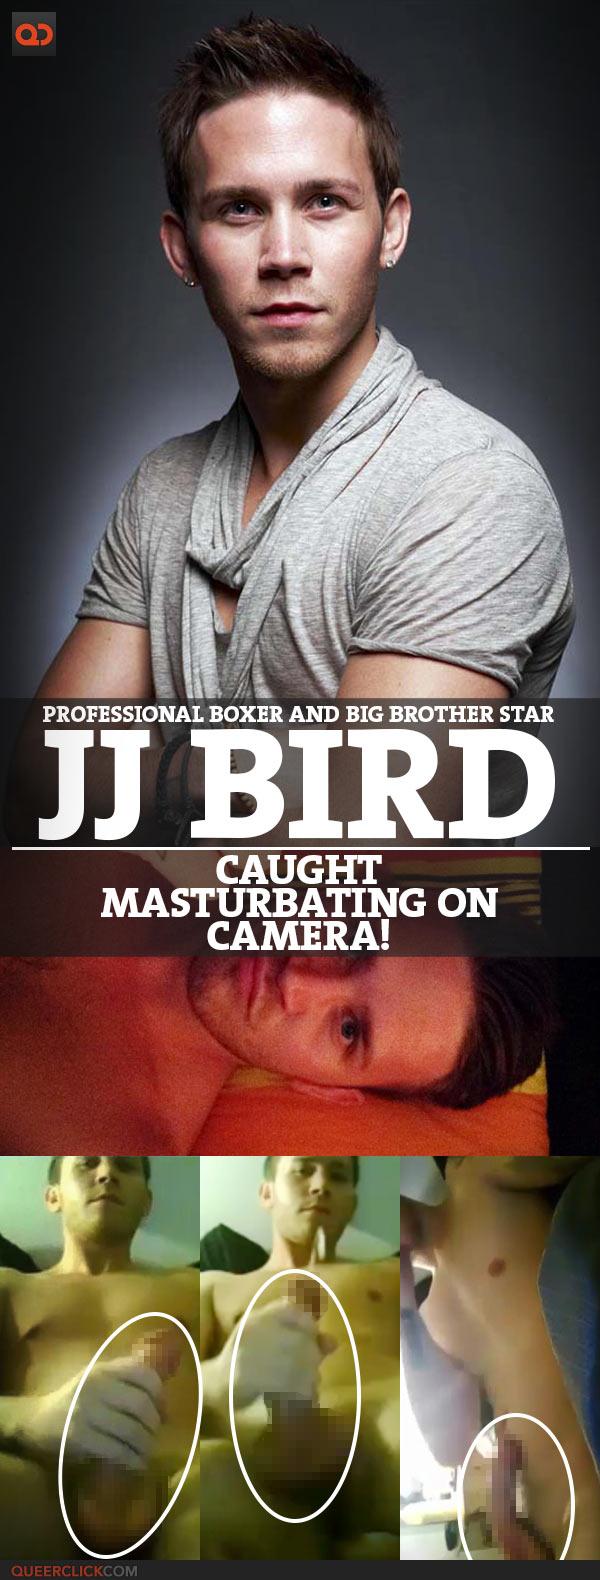 JJ Bird, Professional Boxer And Big Brother Star, Caught Masturbating On Camera!